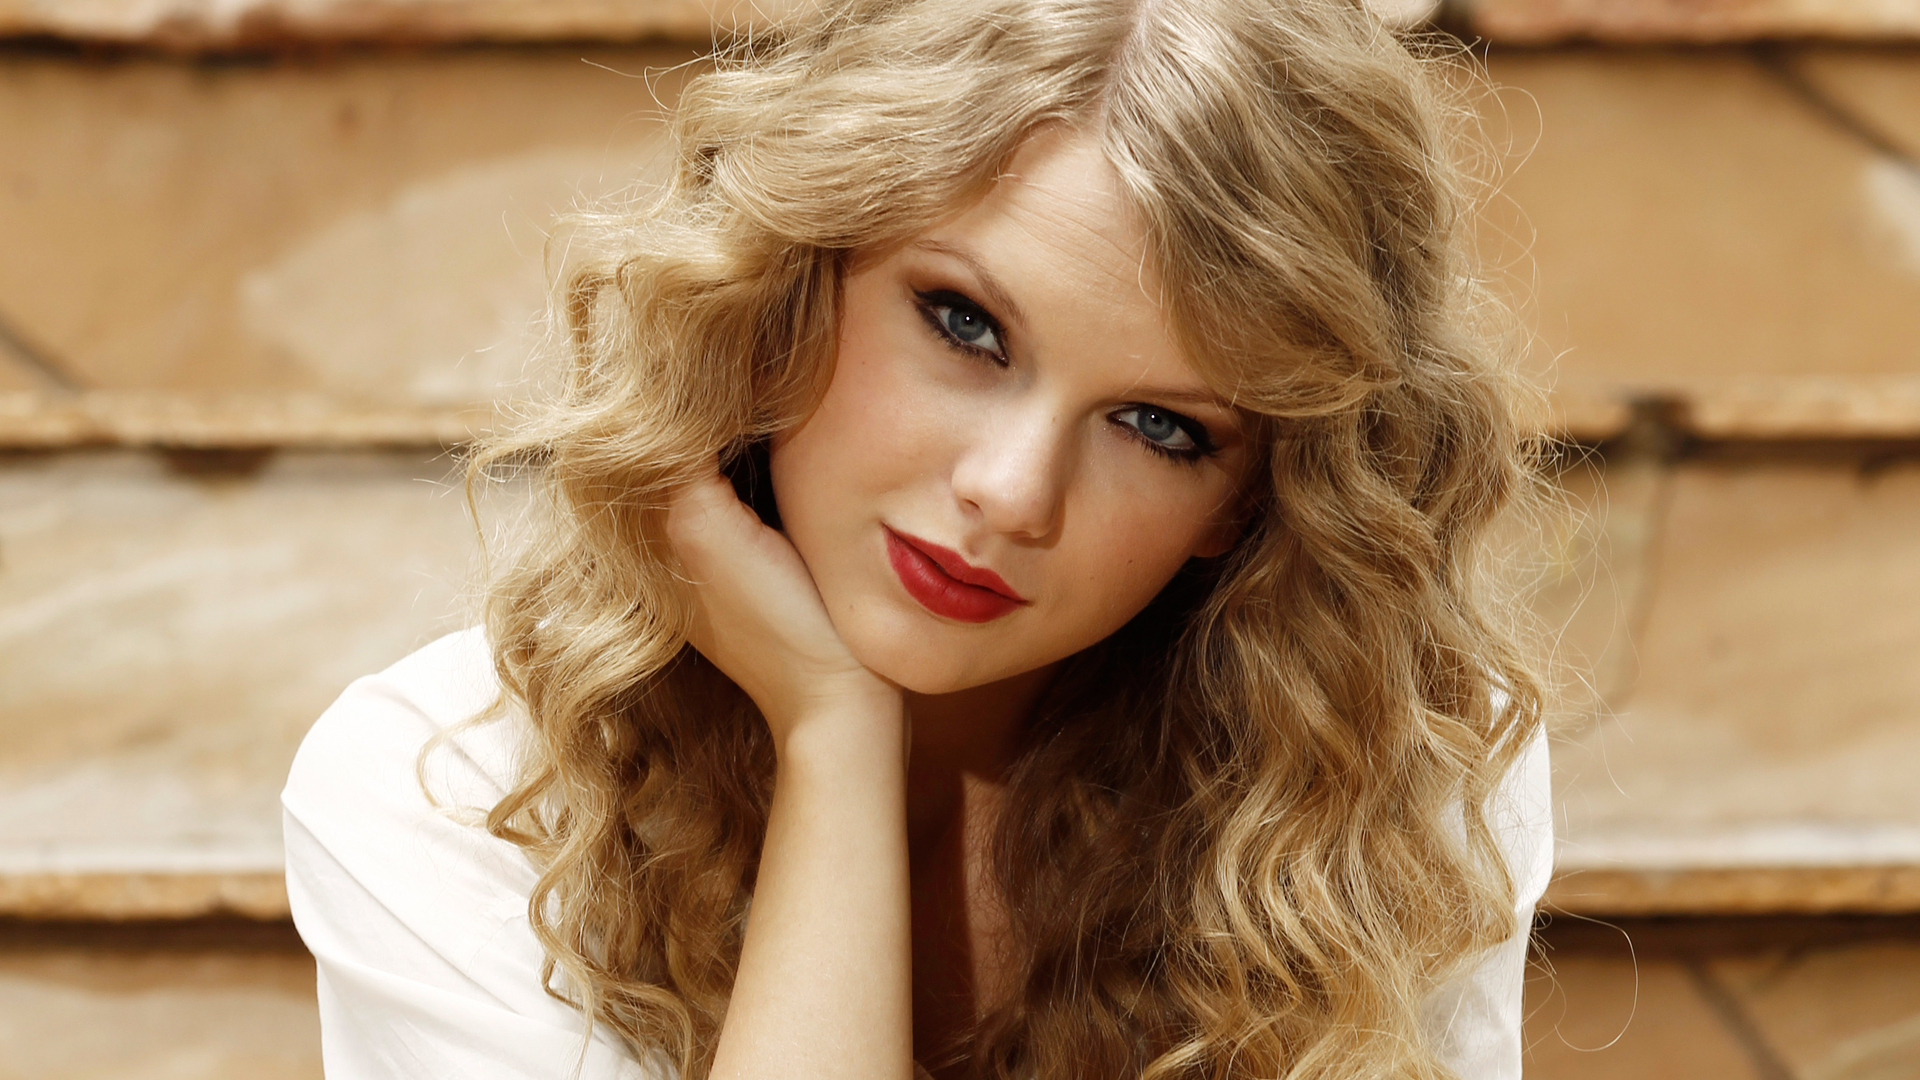 Lovley Taylor Wallpaper   Taylor Swift Wallpaper 19907330 1920x1080